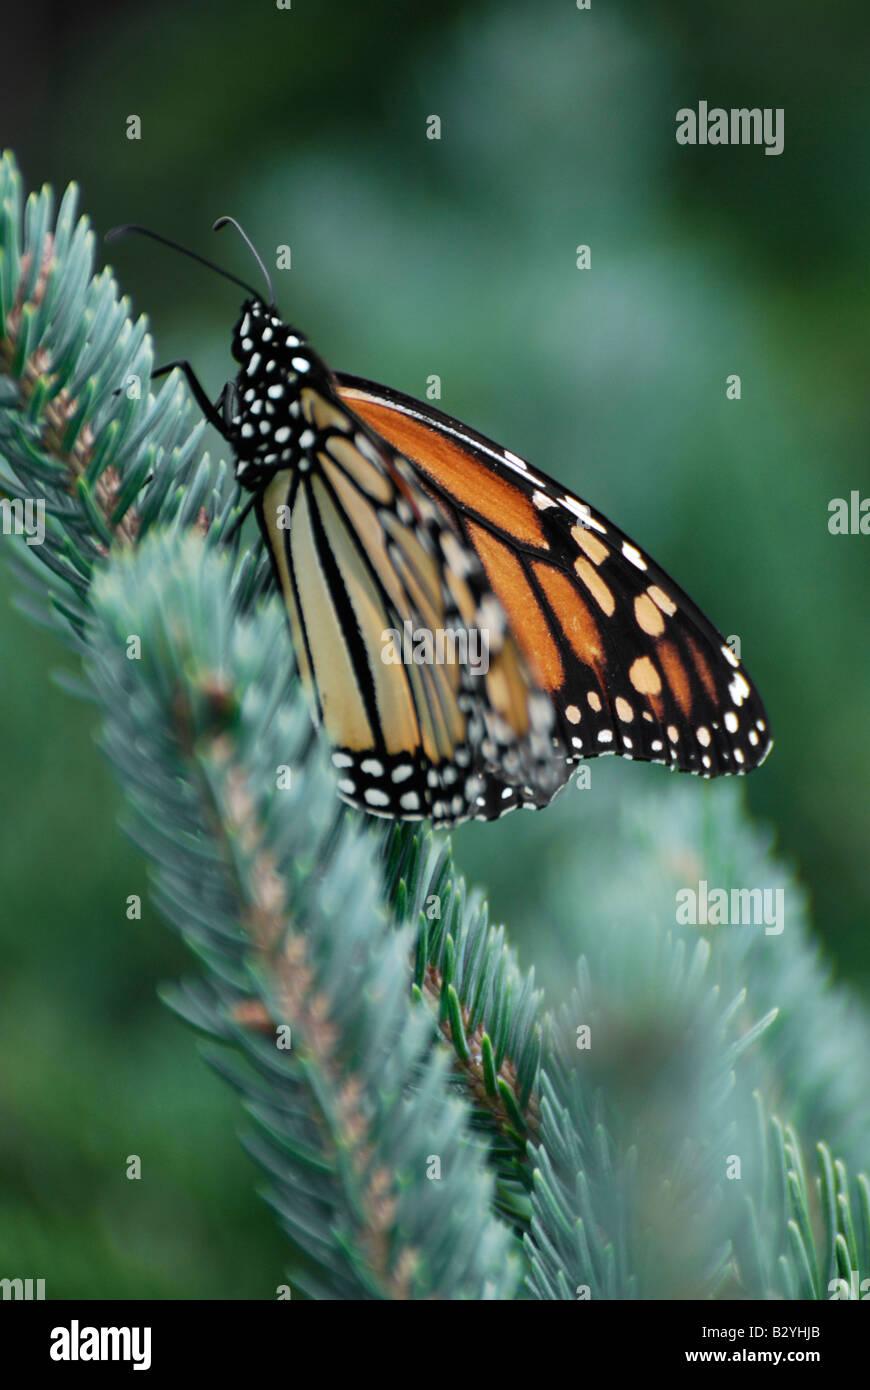 Farfalla monarca (Danaus plexippus) Immagini Stock